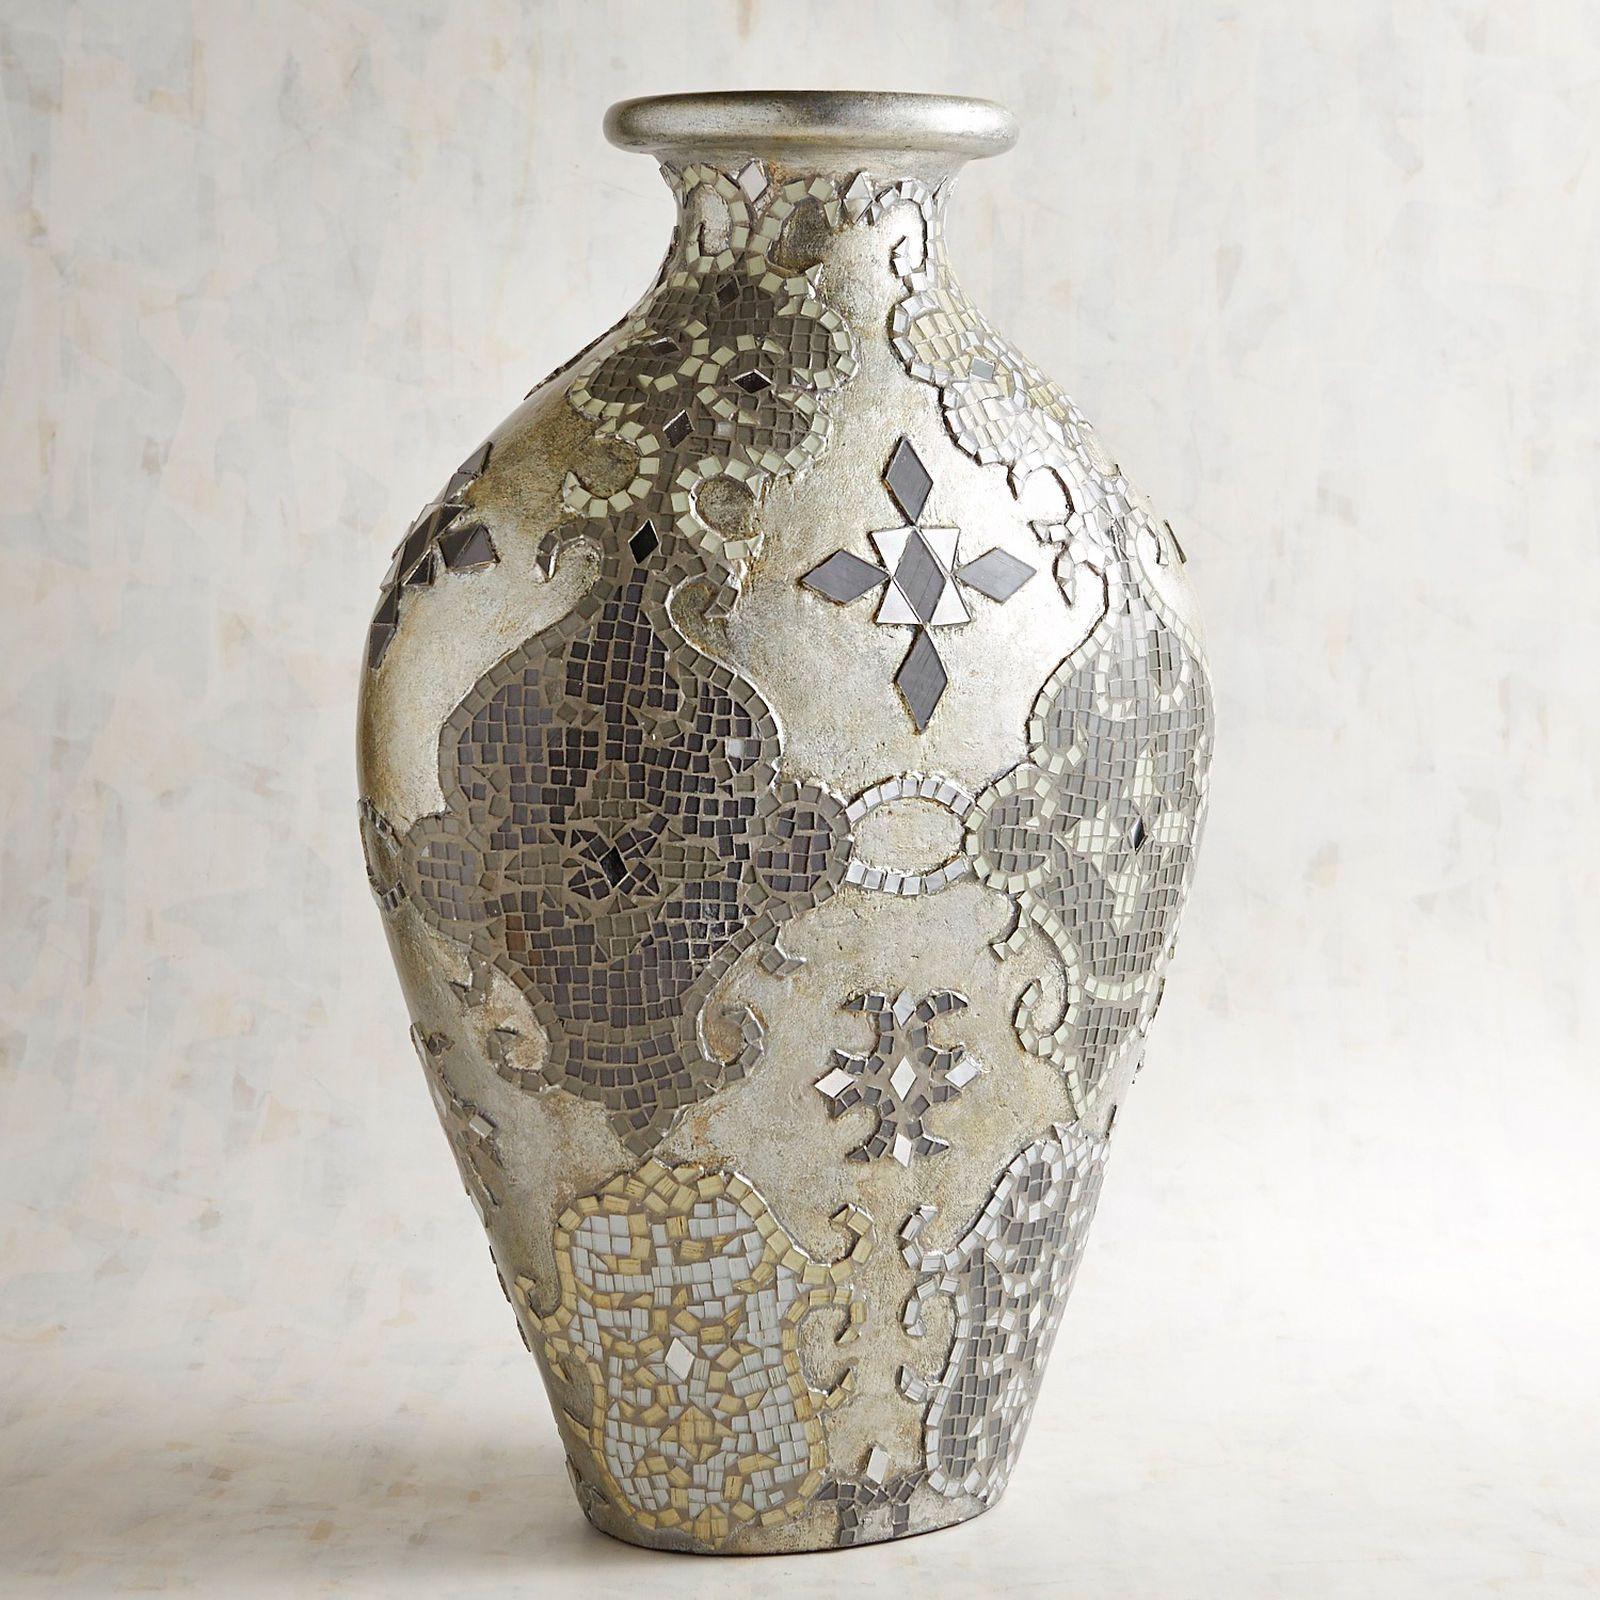 pier 1 floor vase of silver gray mosaic vase mosaic vase and mosaics inside silver gray mosaic vase pier 1 imports